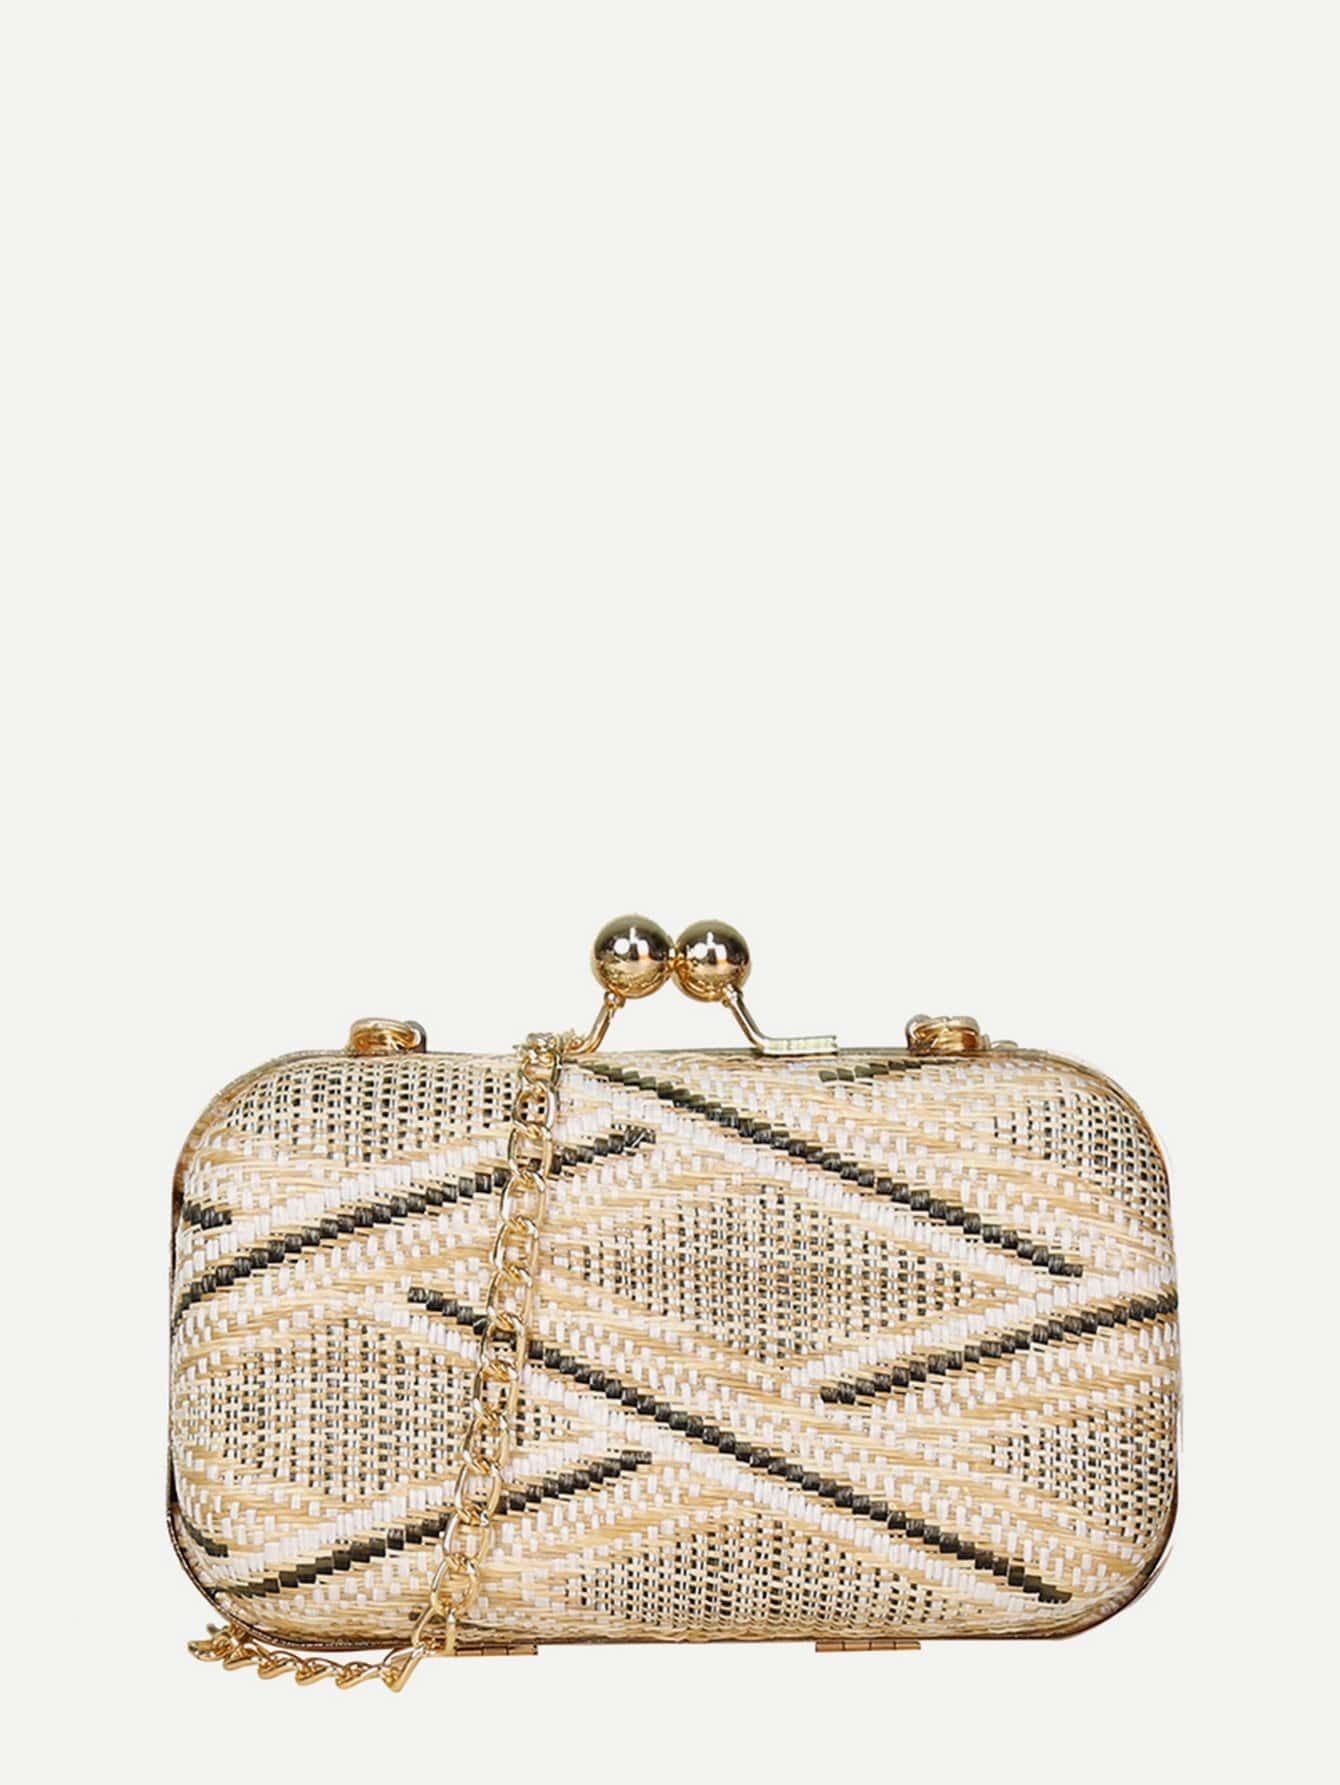 Kiss Lock Chain Clutch 10 5cm arch metal purse frame handle for clutch bag handbag accessories making kiss clasp lock antique bronze tone bags hardware